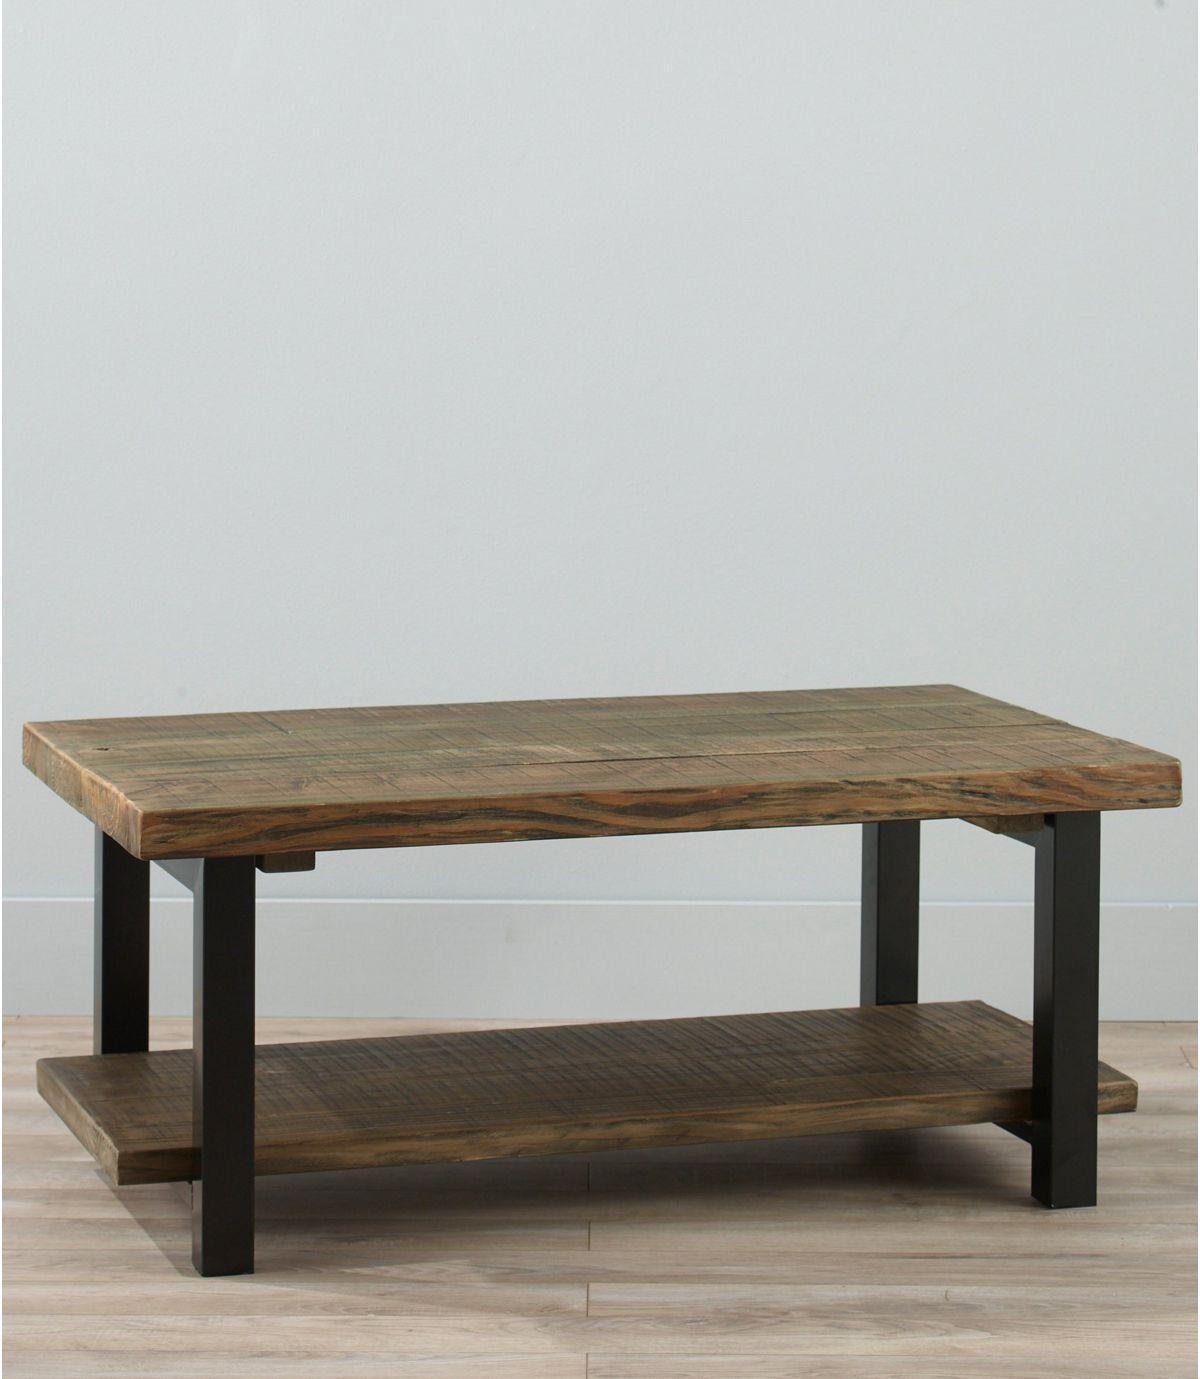 Rough Pine Coffee Table Coffee Table Pine Coffee Table Coffee Table Wood [ 1379 x 1200 Pixel ]